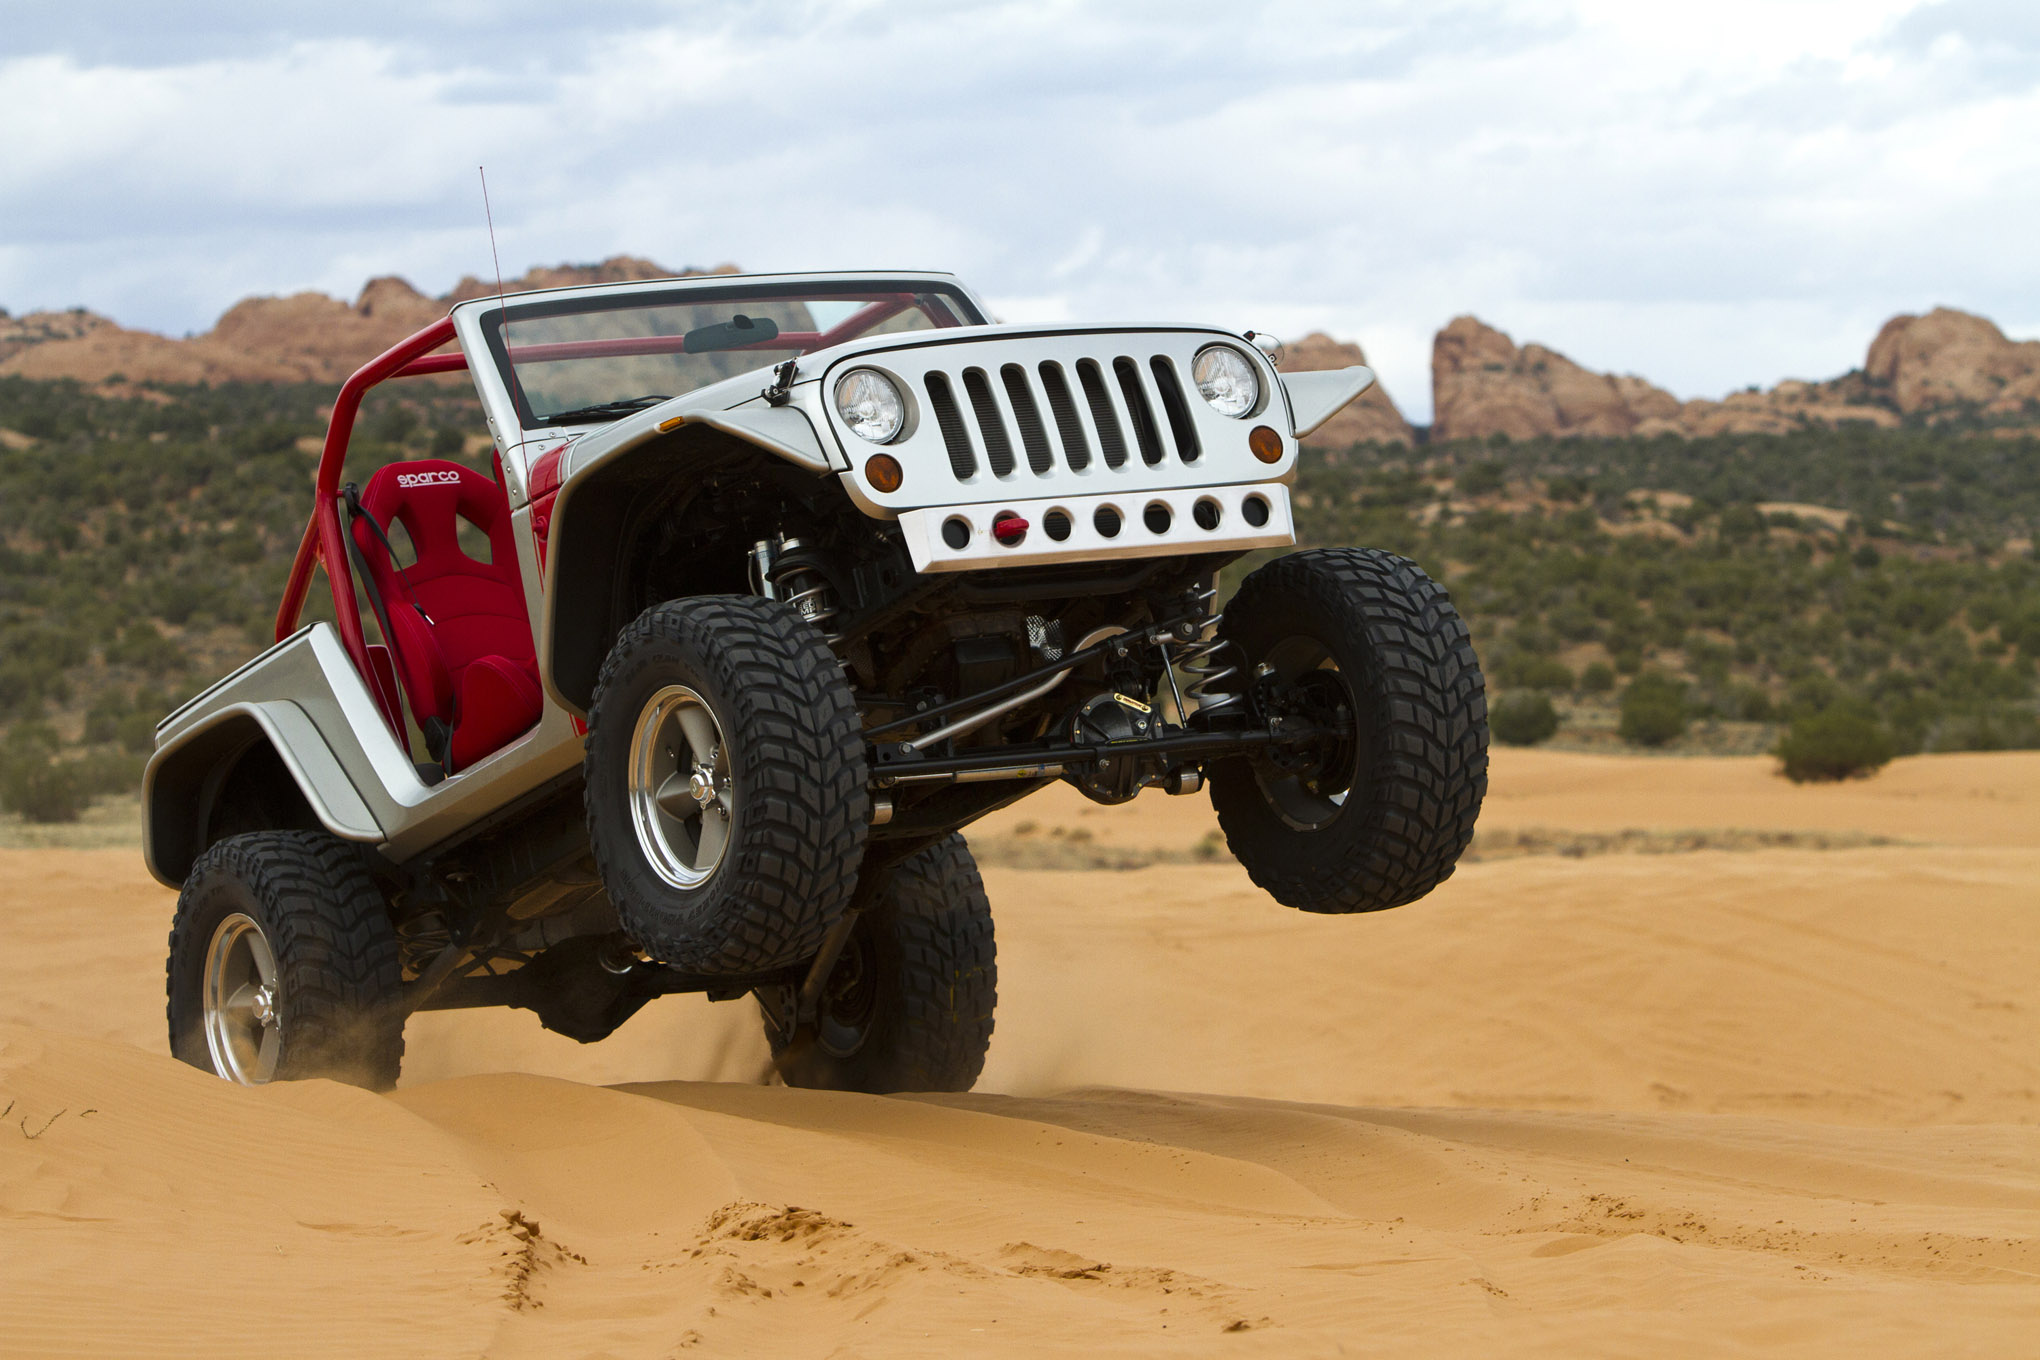 techline jeep wrangler jk porkchop pork chop moab concept lightweight